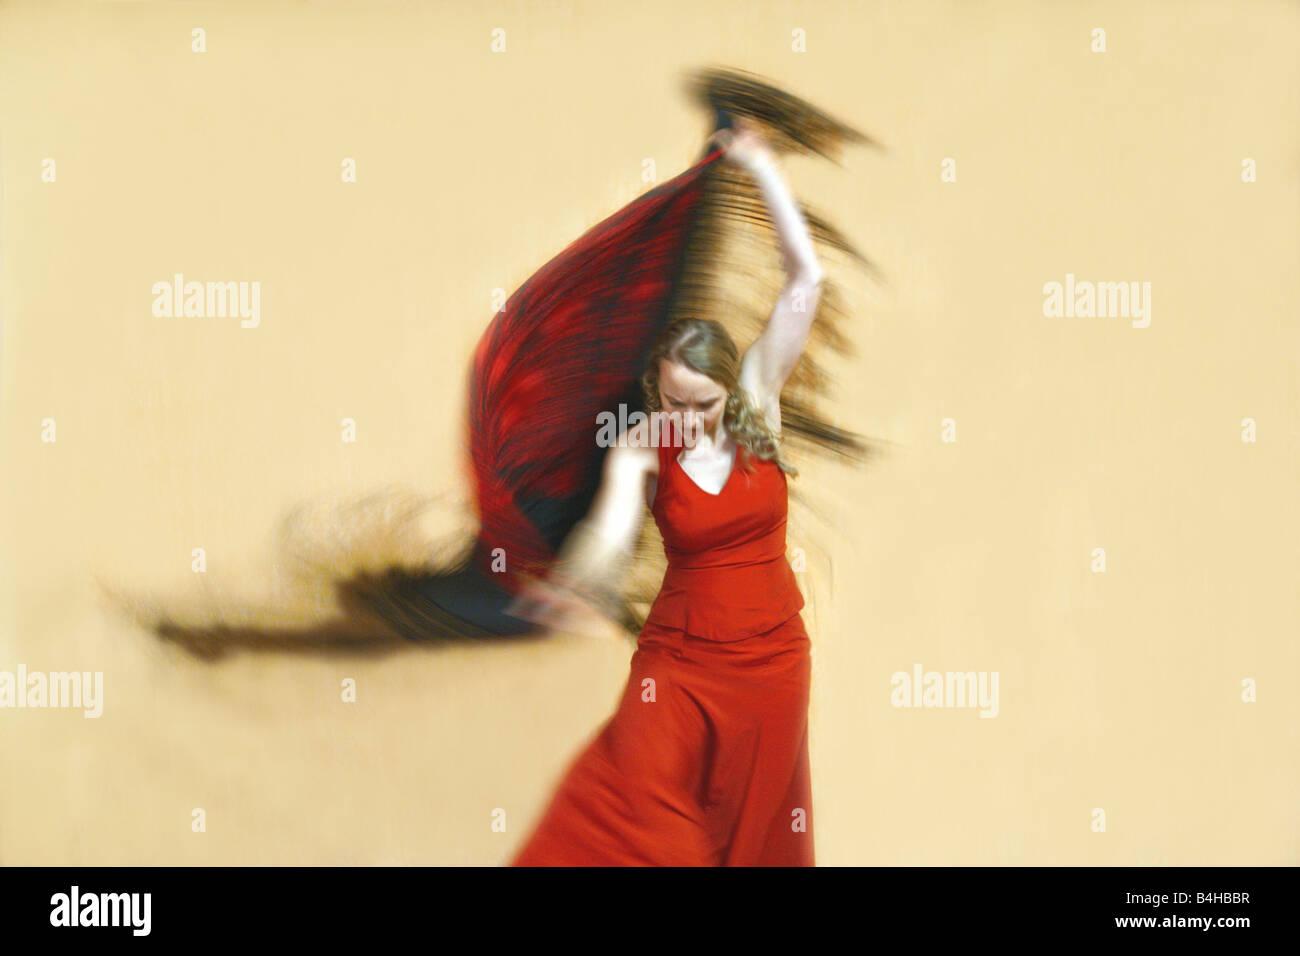 High angle view of female flamenco dancer dancing - Stock Image